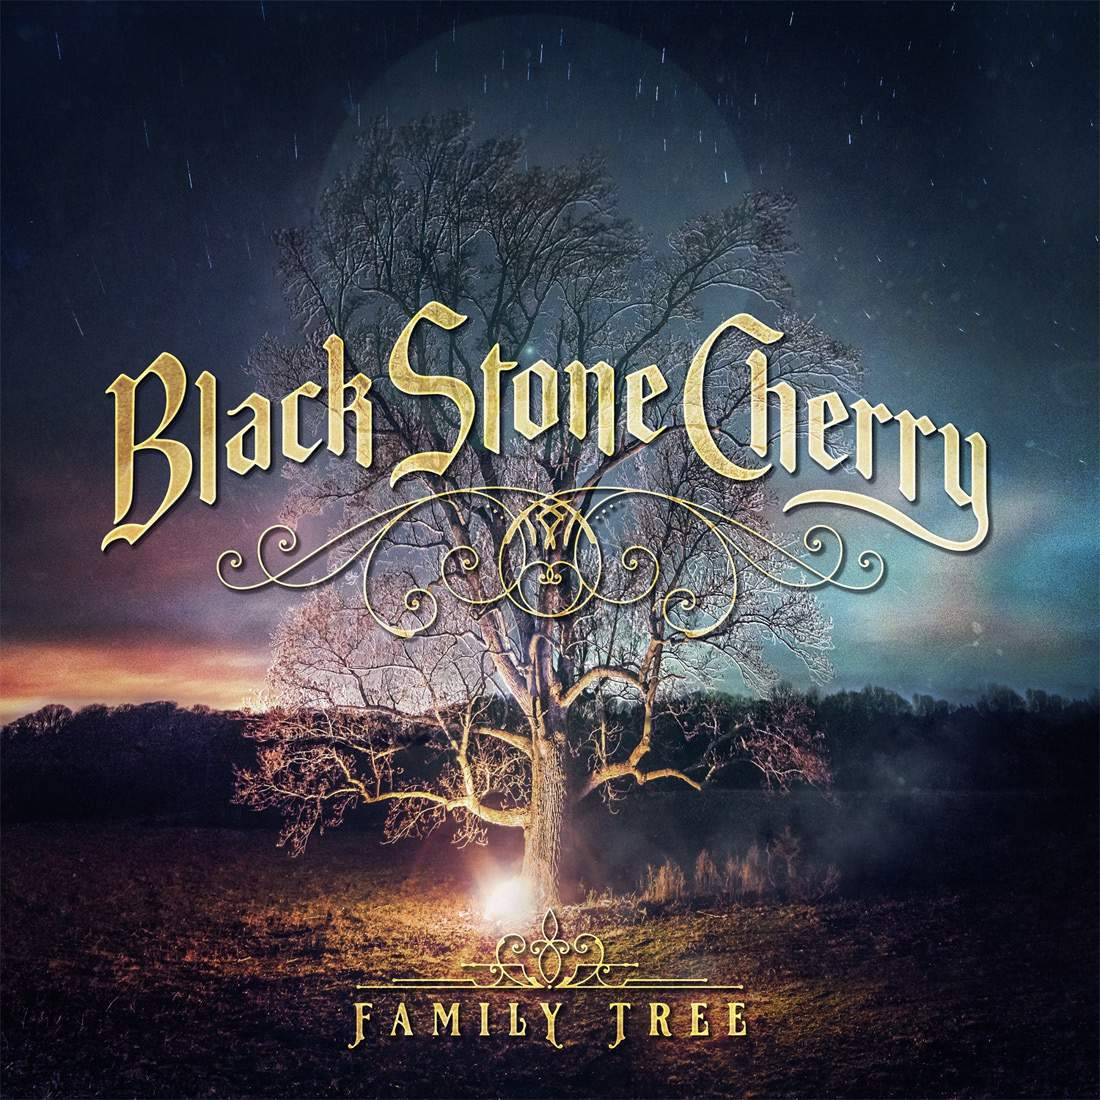 Black Stone Cherry 2018